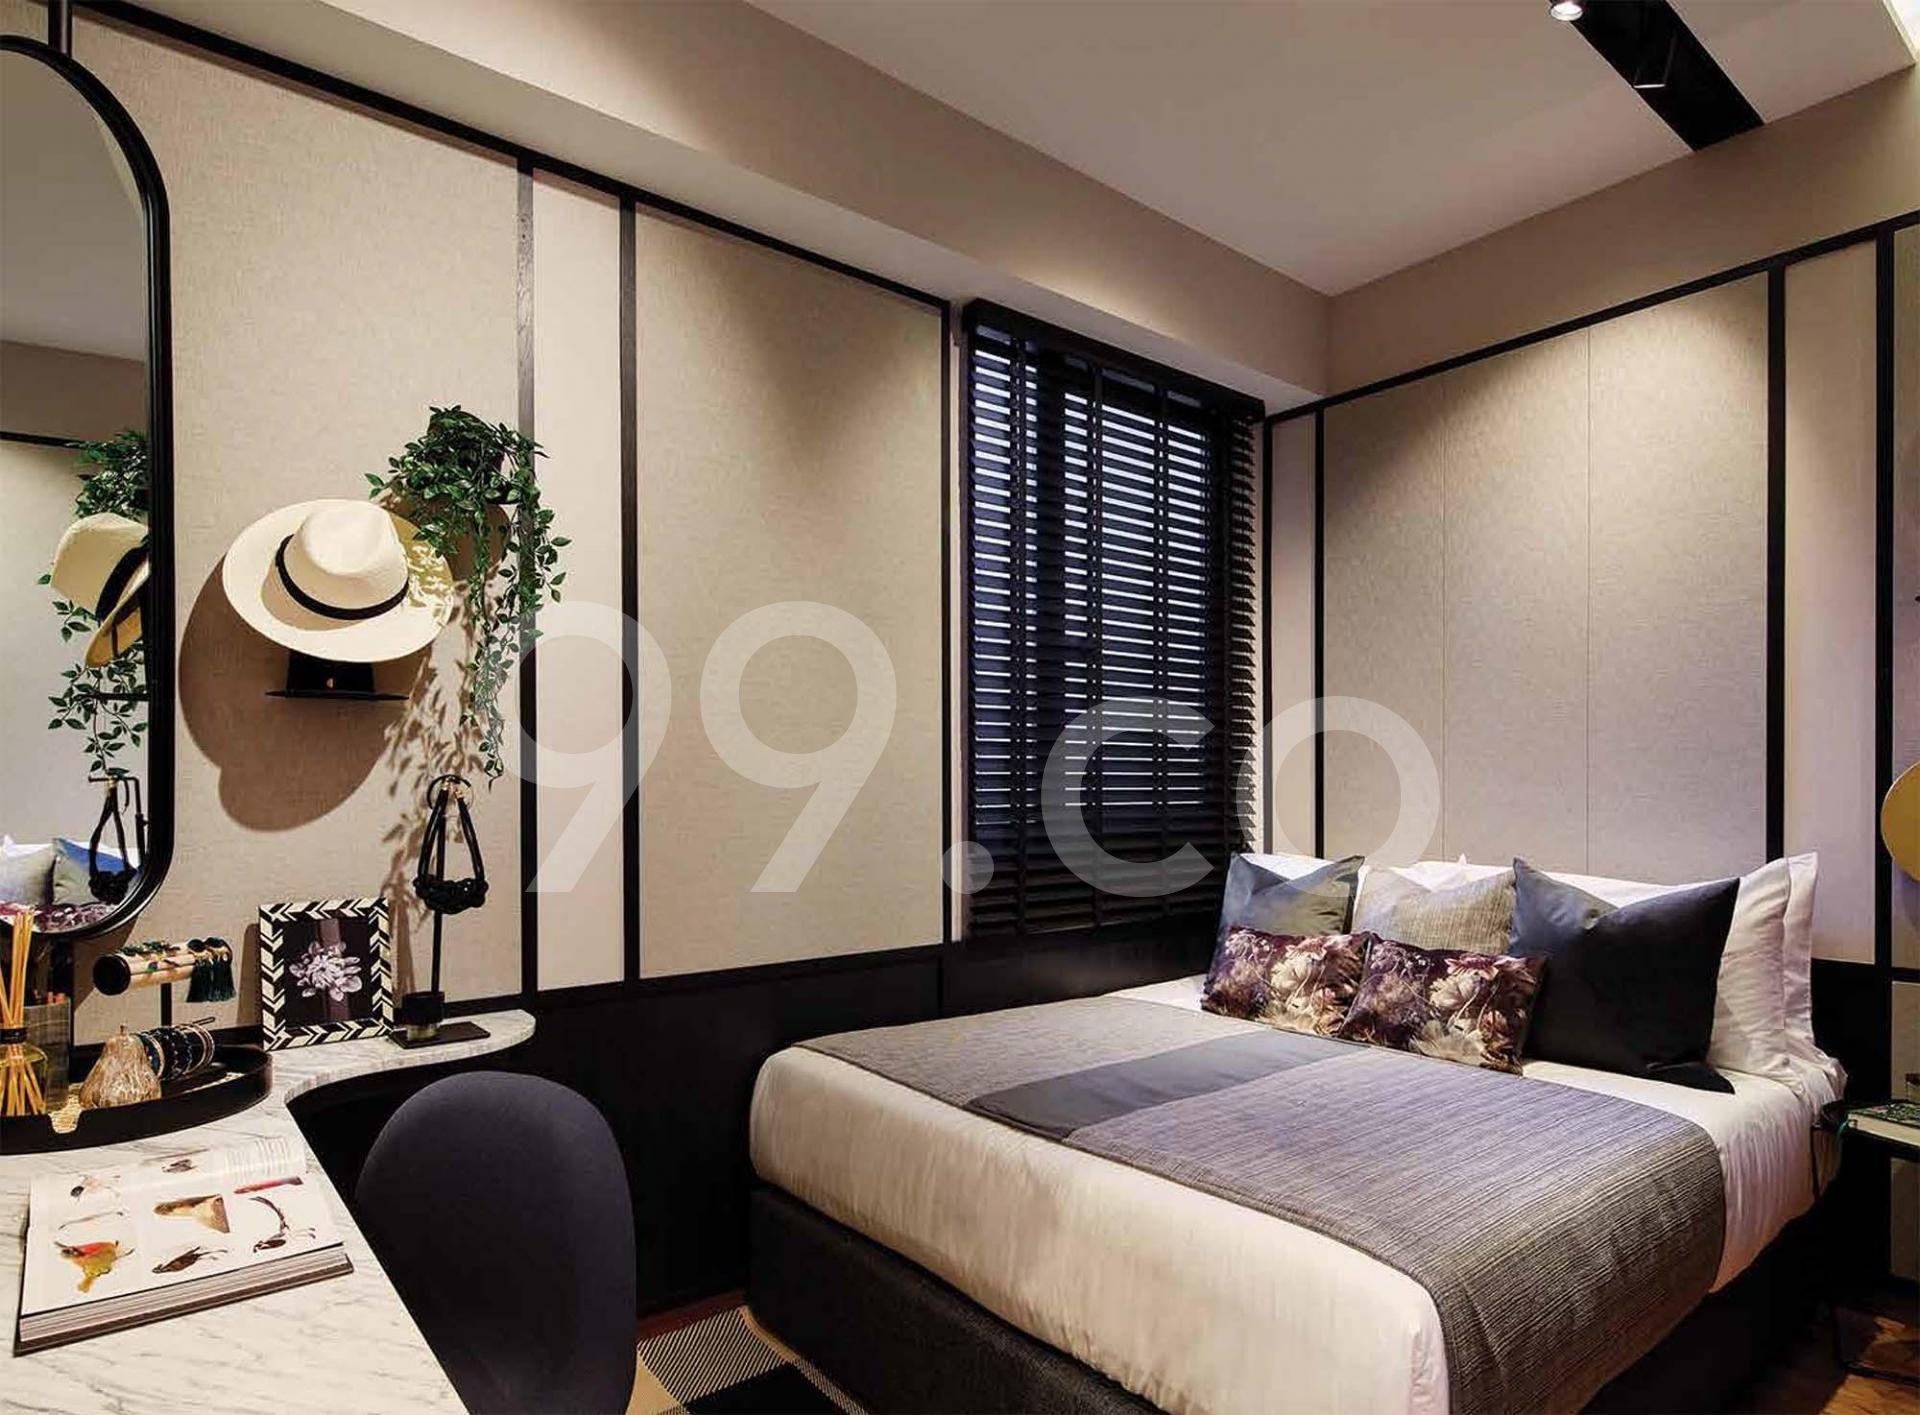 Bukit 828 Bedroom